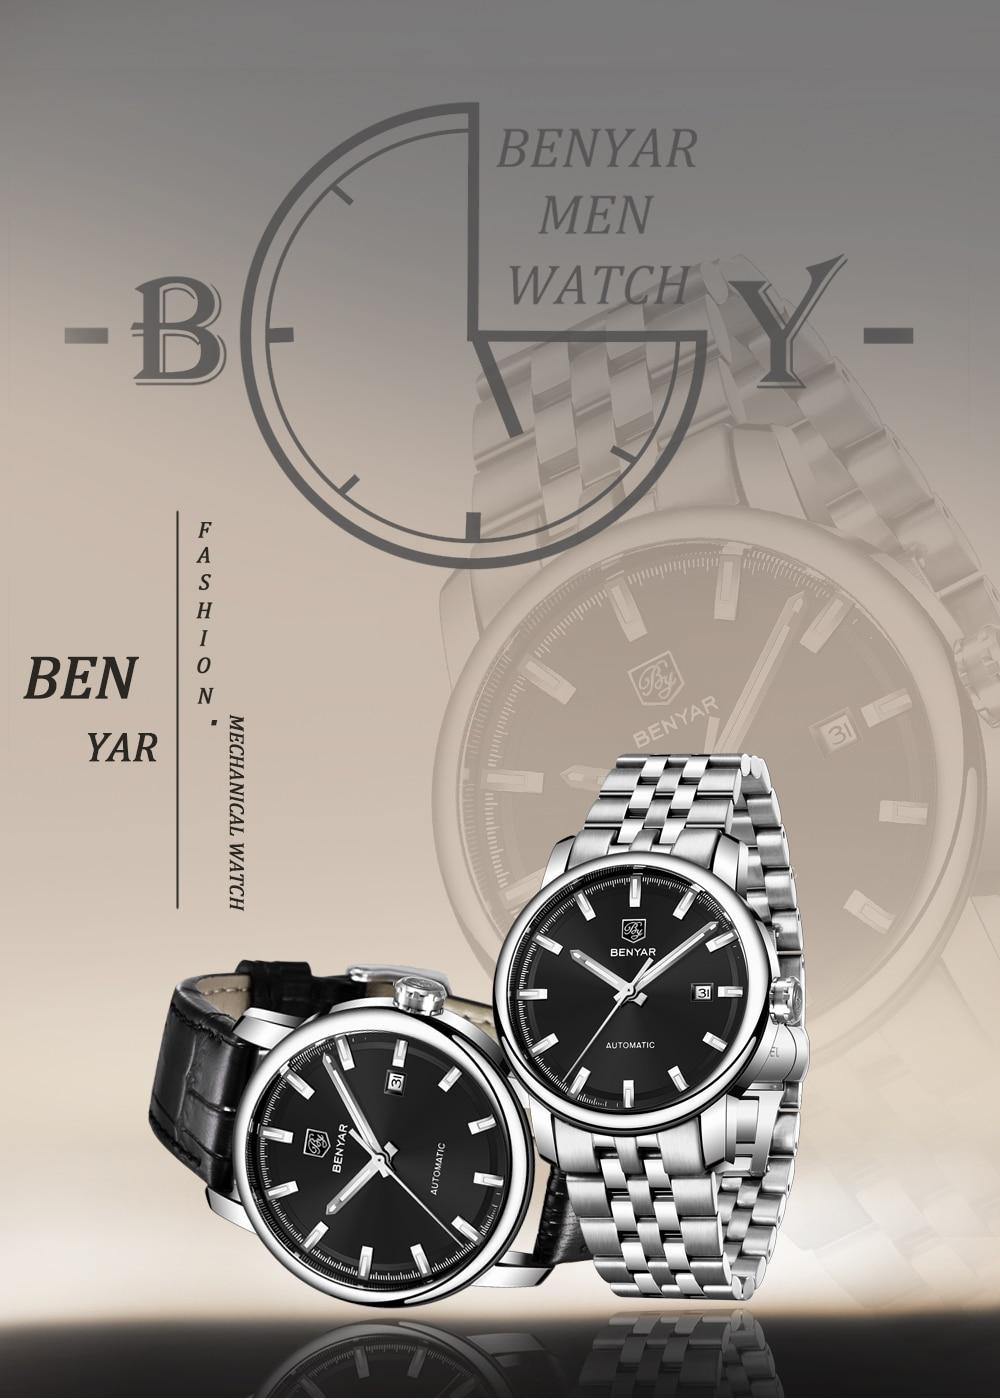 HTB1btp XX67gK0jSZPfq6yhhFXa7 New BENYAR Men's Mechanical Watches Automatic Mens watches Top Brand Luxury watch men WristWatch Military Relogio Masculino 2019